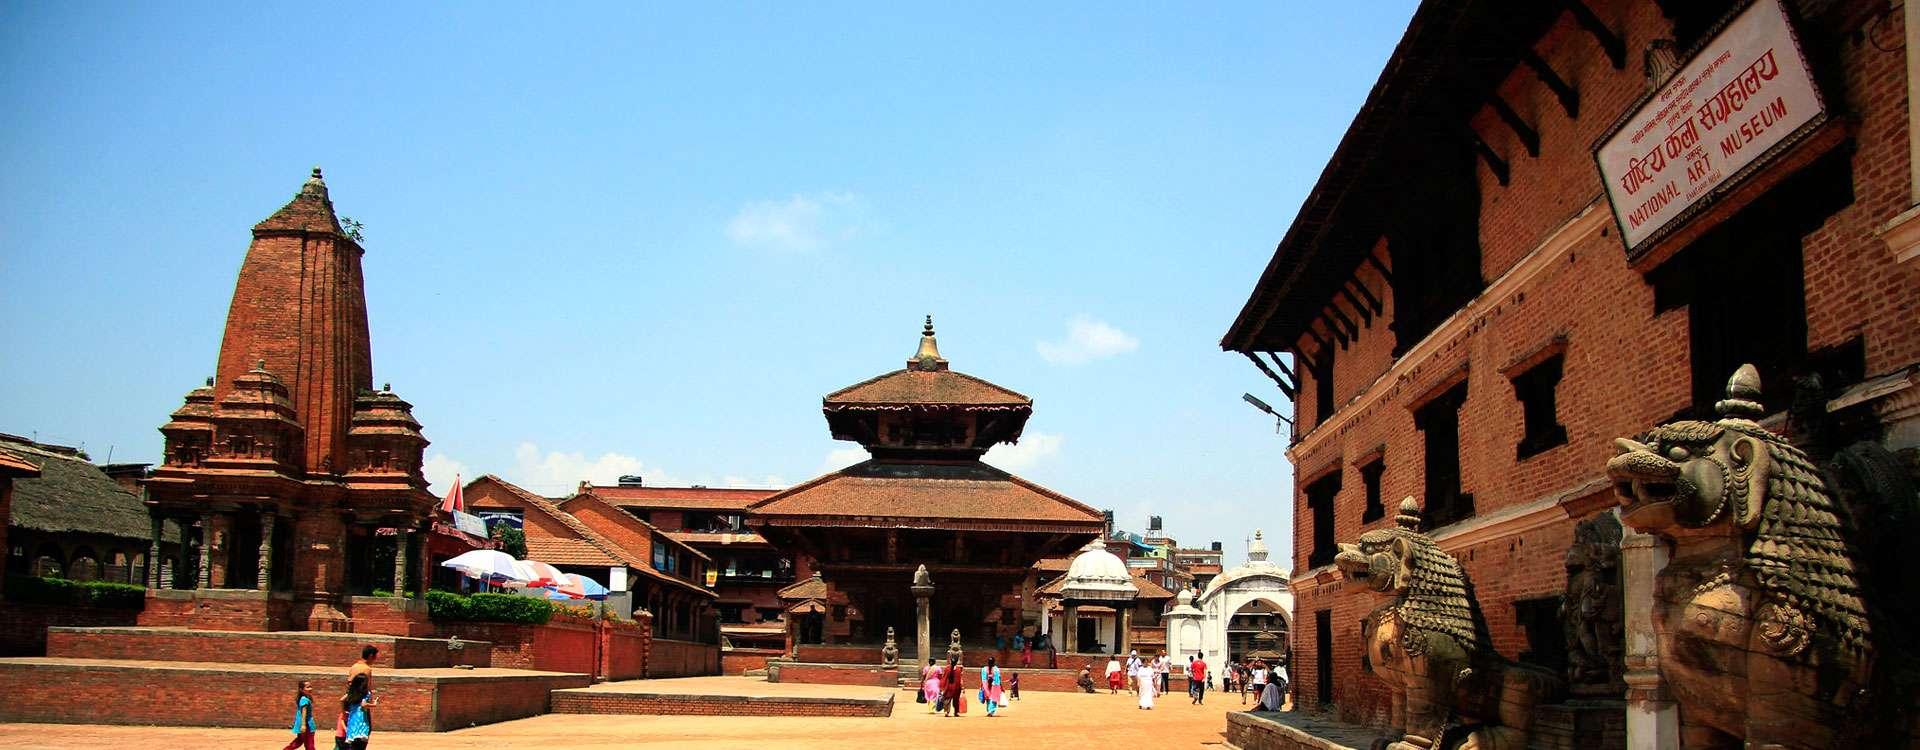 Bhaktapur Durbar Square Tour